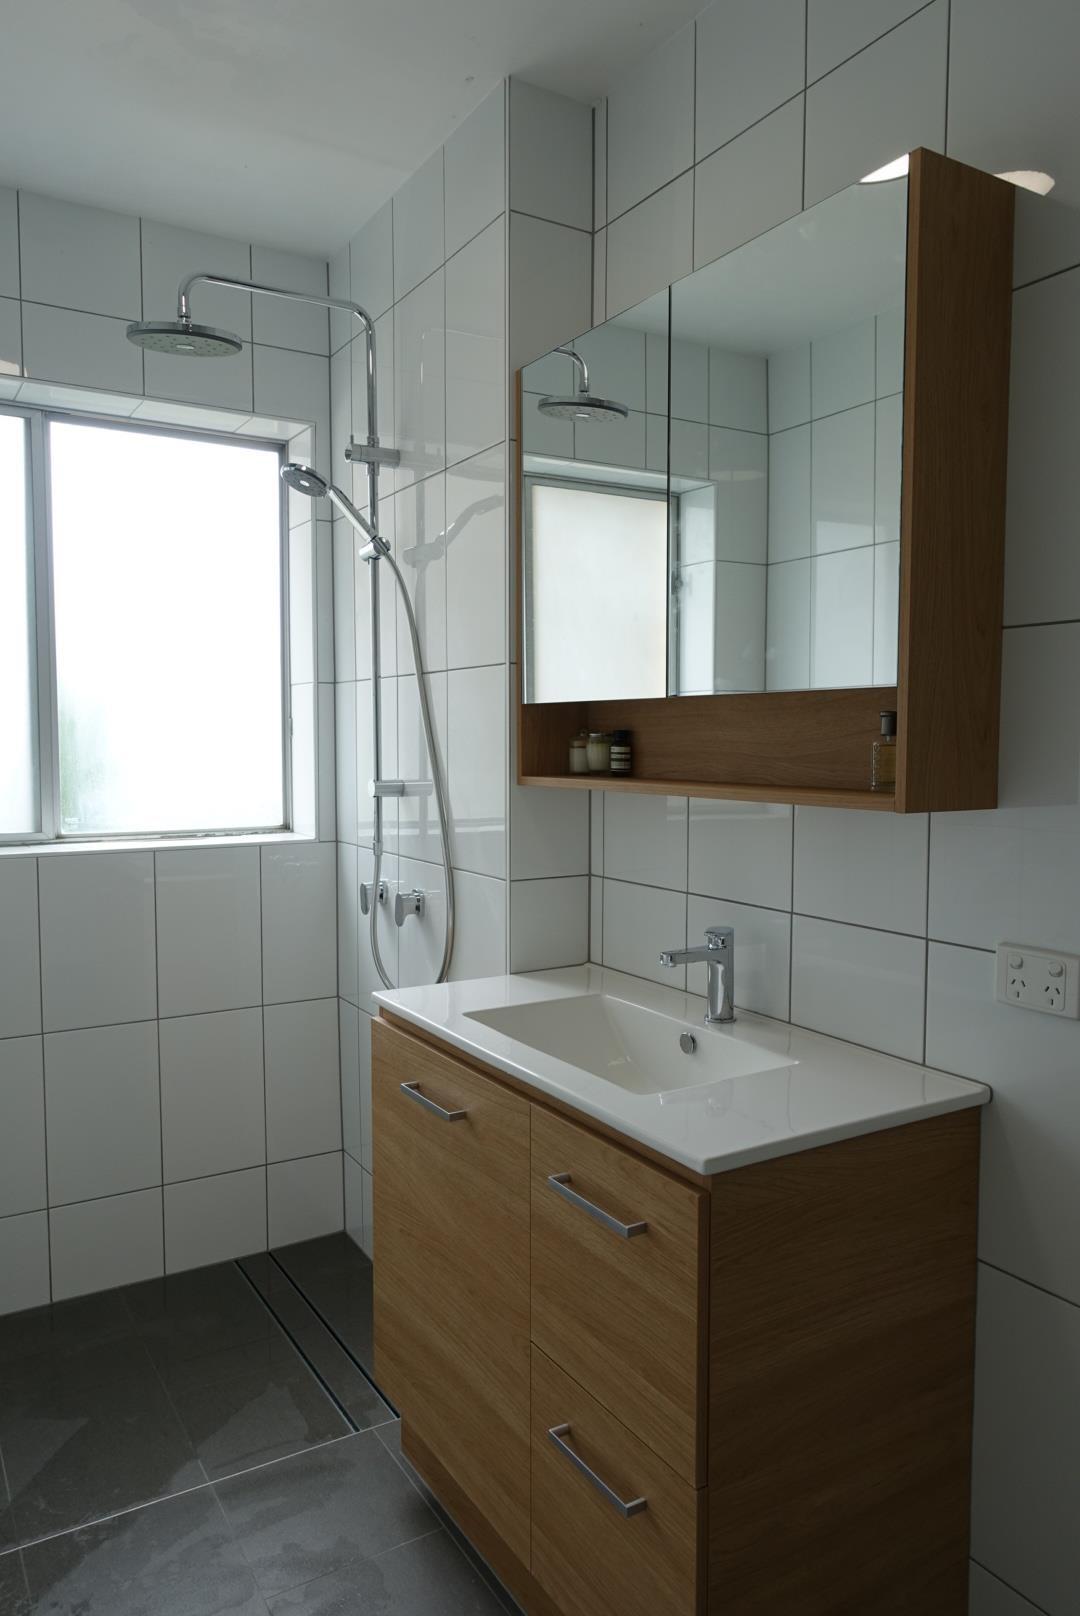 Brisbane laundry renovations laundry design ideas ine bathrooms - Greenslopes Main Shower Laundry Renovation 1 Bathroom Renovations Brisbane Company